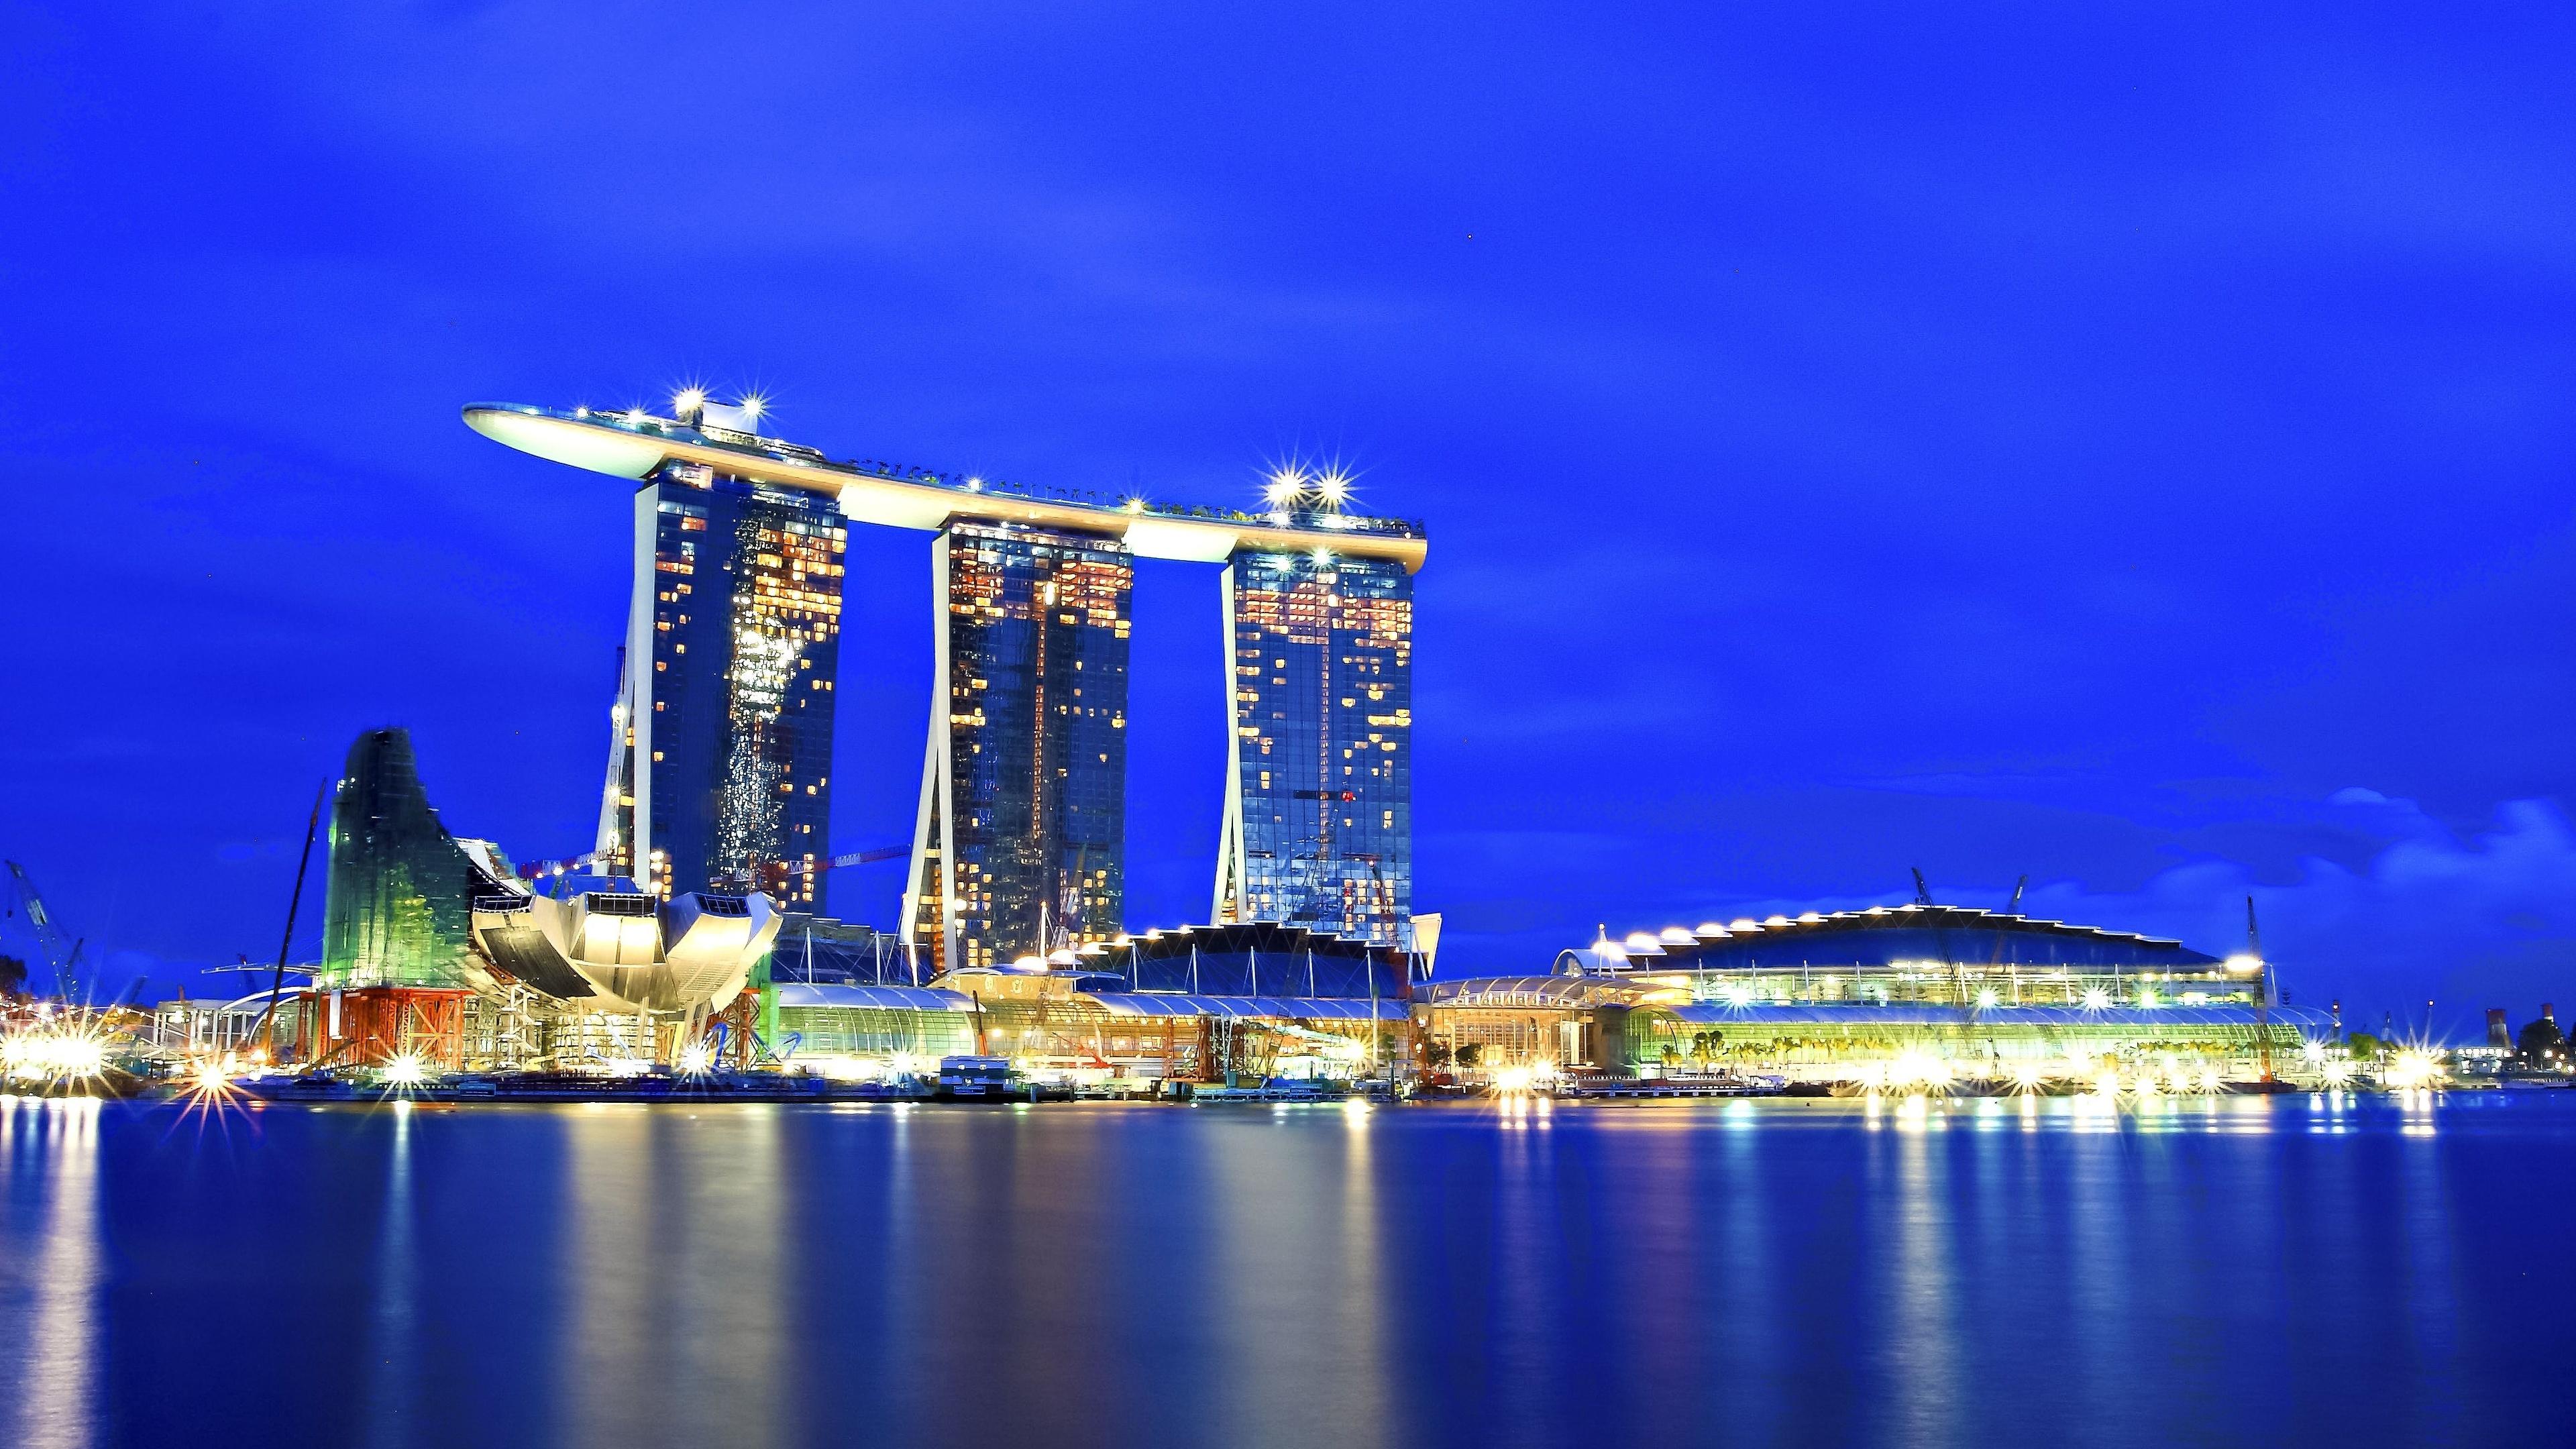 Singapore City 4K Wallpaper Wide Screen Wallpaper 1080p2K4K 3840x2160